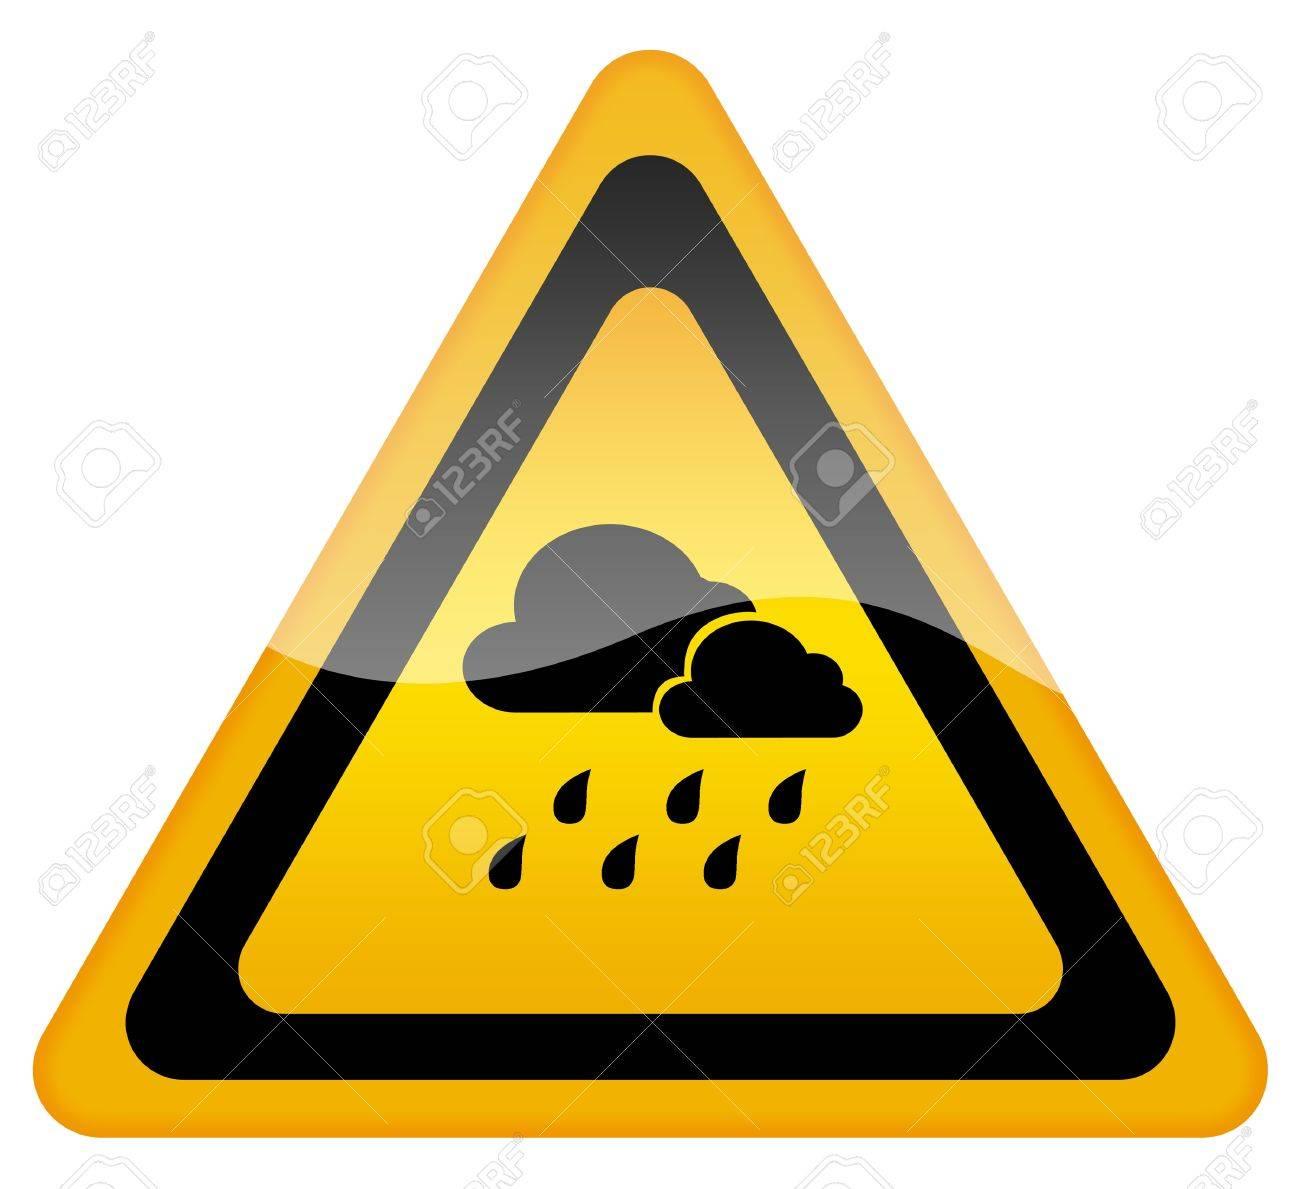 Rainy weather warning sign stock photo picture and royalty free rainy weather warning sign stock photo 8623308 buycottarizona Image collections